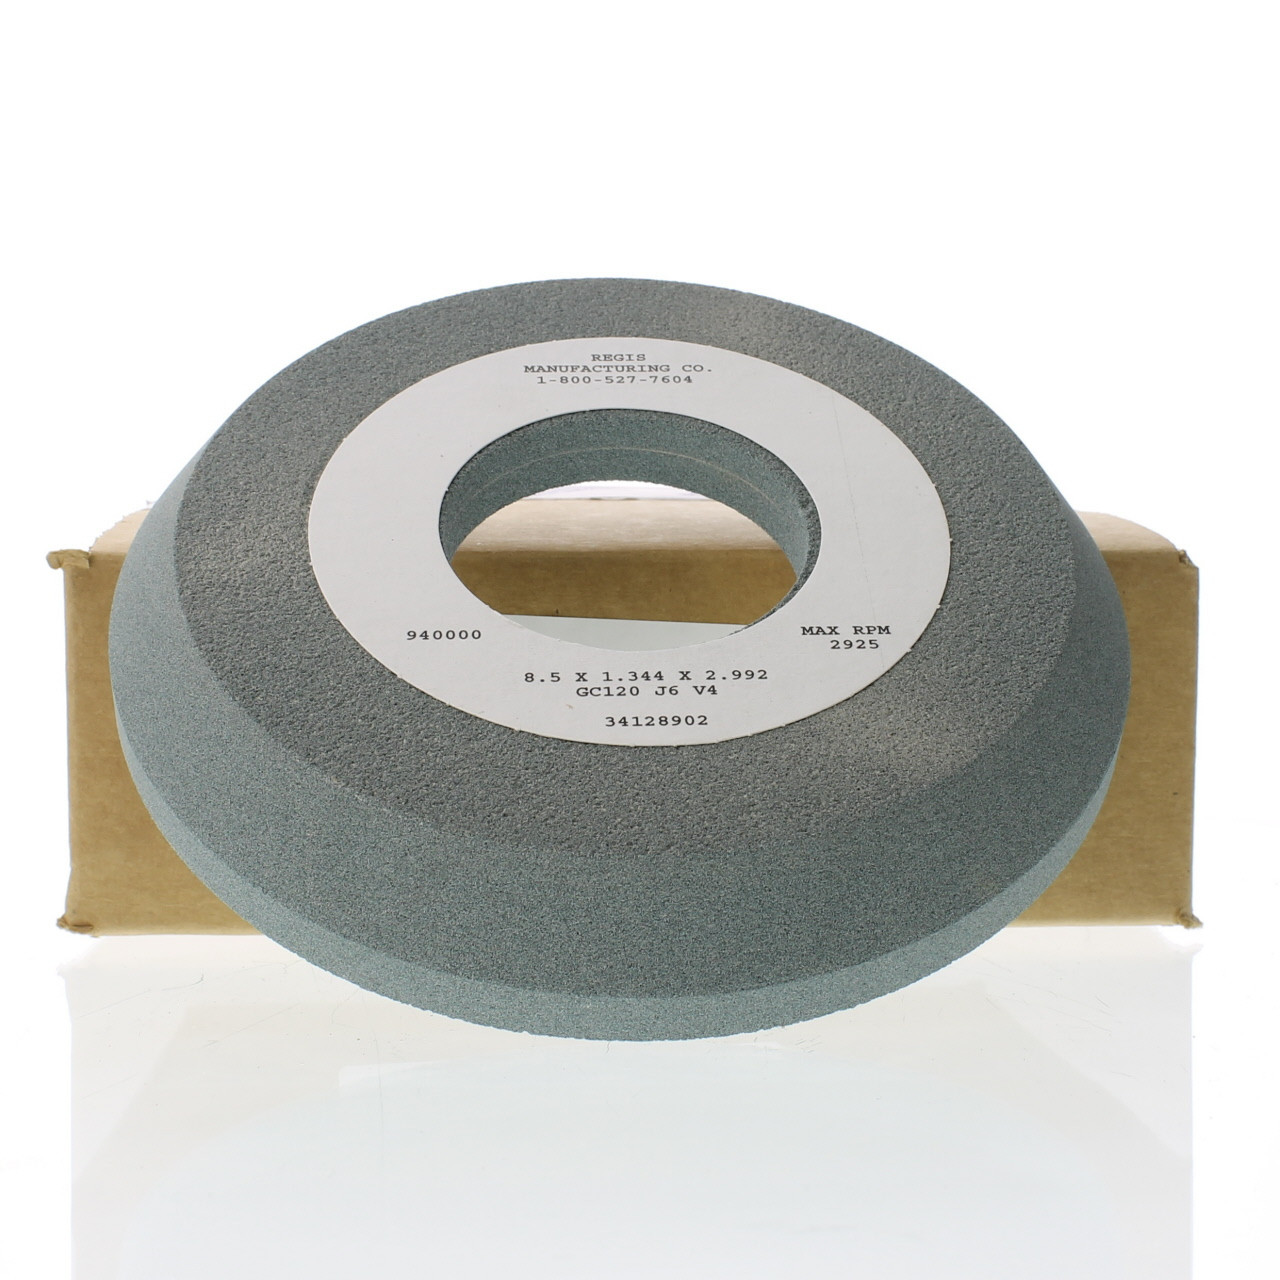 215mm X 35mm X 76mm Flare Titanium Valve Refacer Wheel K 821 Regis Manufacturing